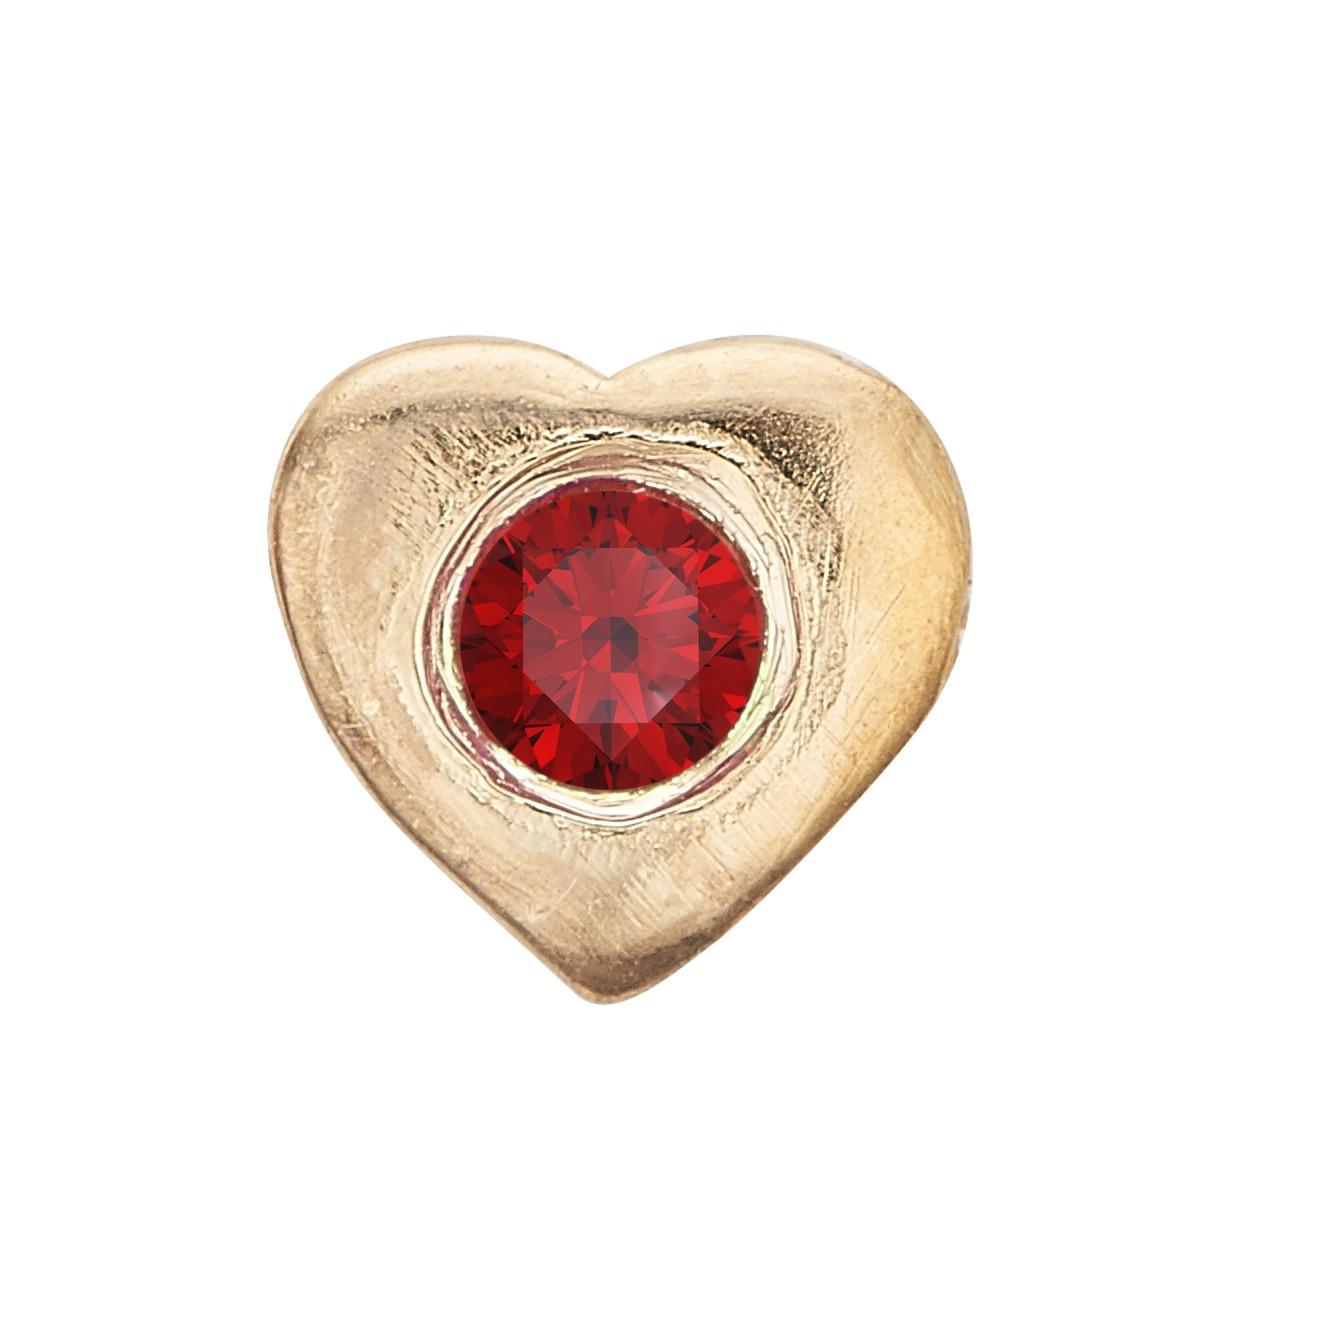 Christina collect ruby heart - 603-g2 fra christina watches fra brodersen + kobborg